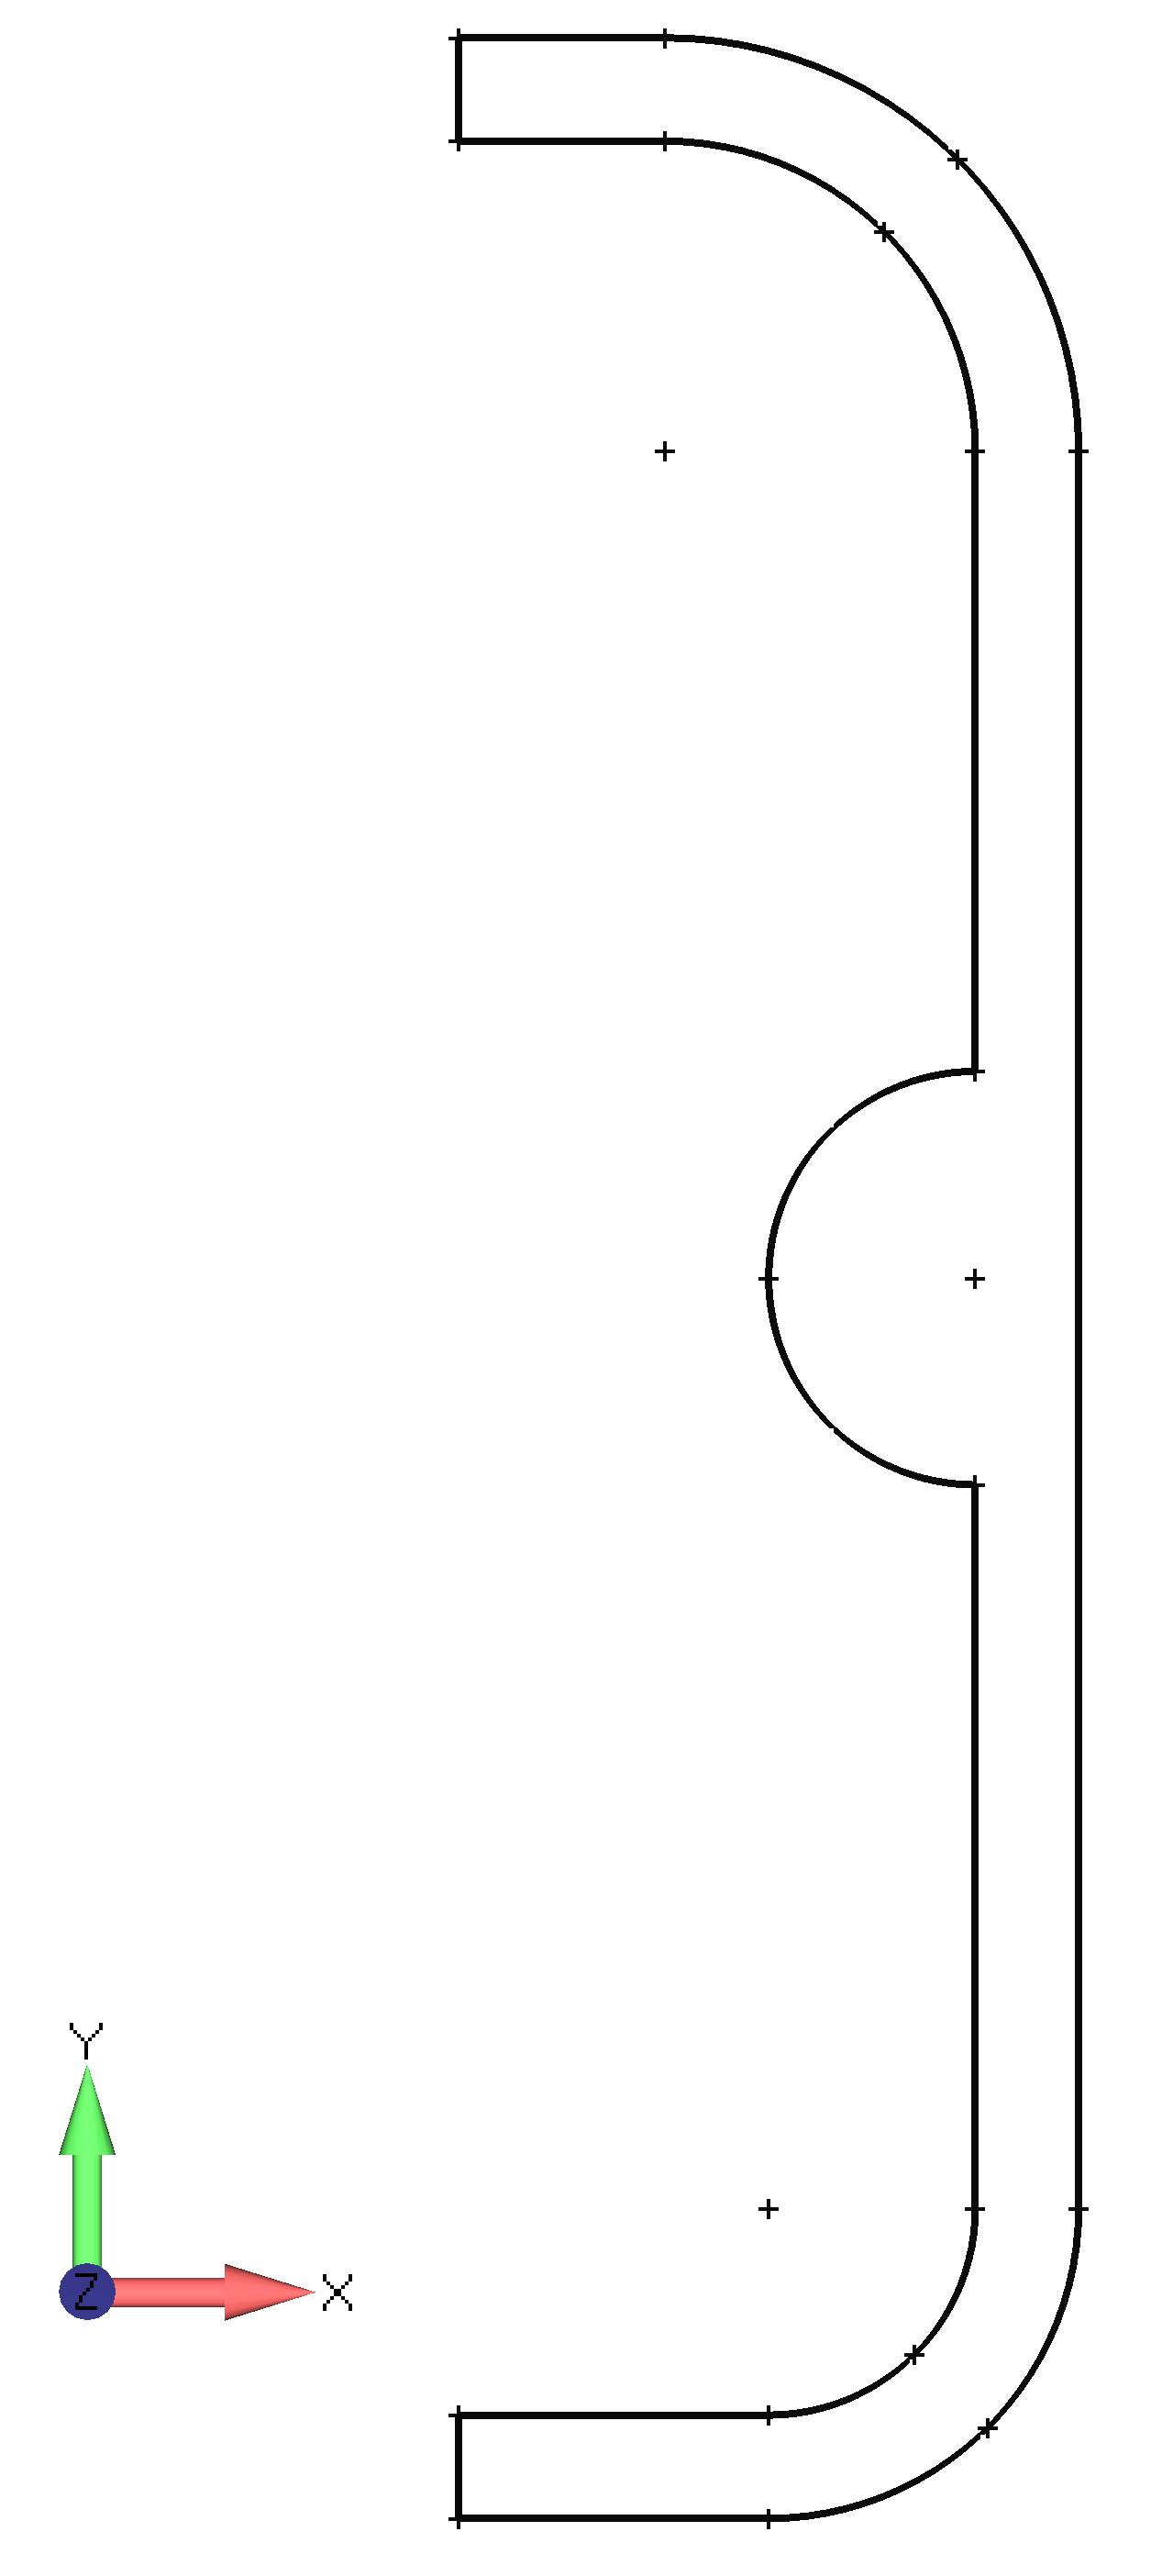 Femap NX Nastran импорт геометрии в формате DXF